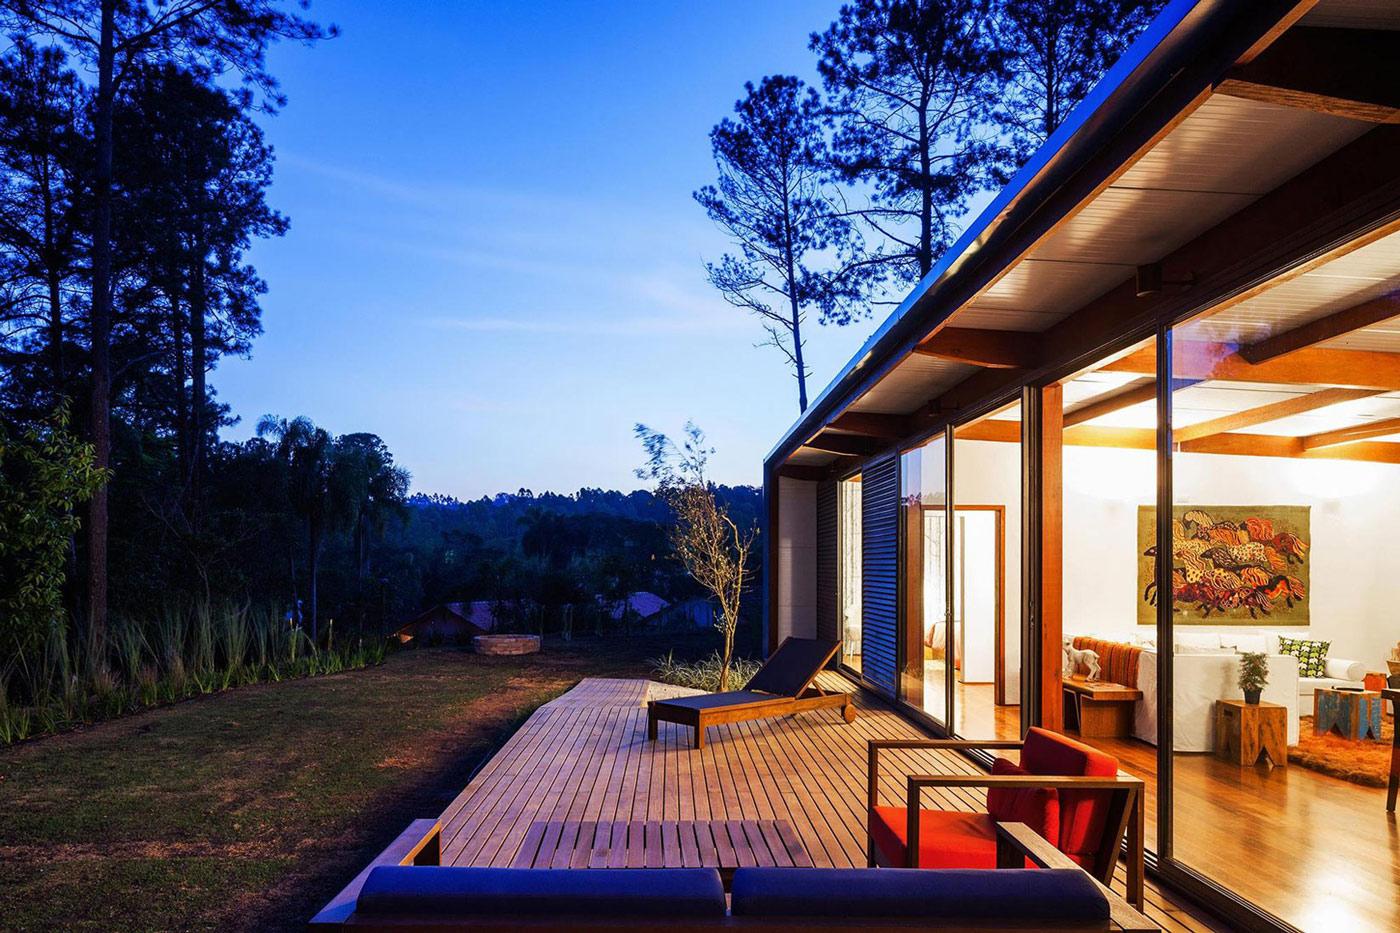 Evening, Lighting, Deck, Glass Walls, Small Summer House in São Roque, Brazil